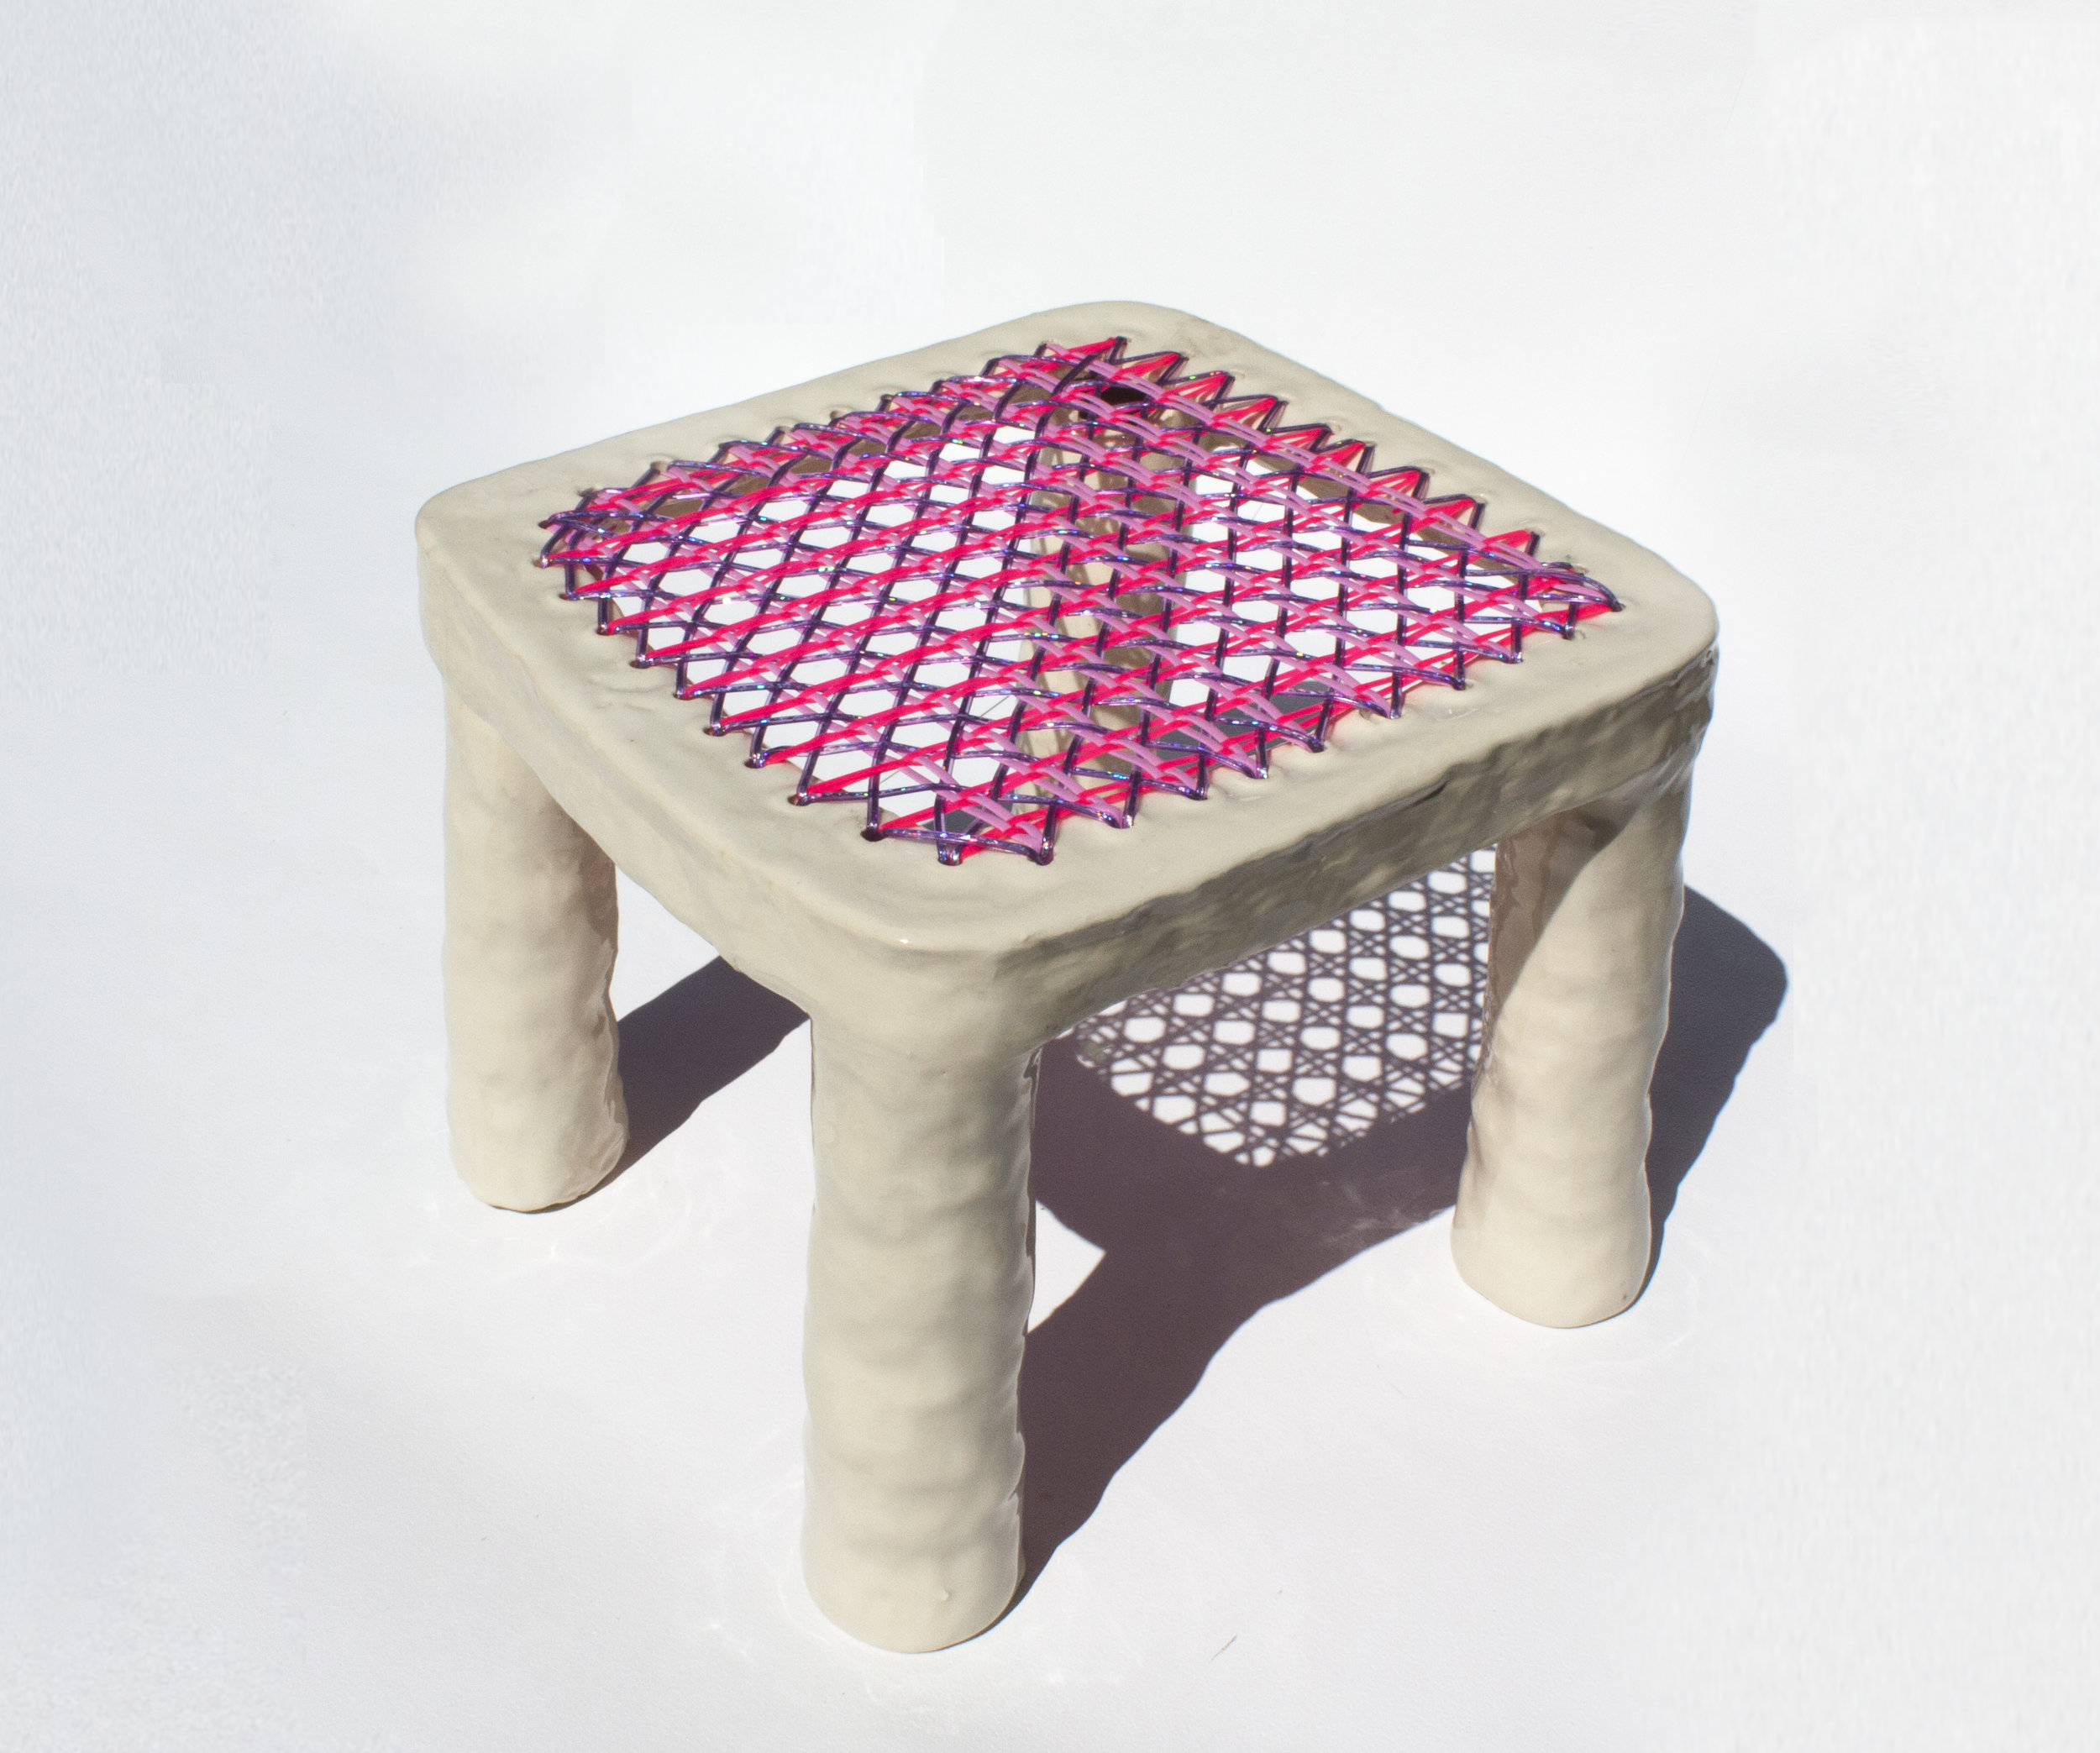 "Stool 1 (Lisa Frank), Ceramic sculpture, plastic lacing cord, 10"" x 10"" x 10"", 2018"